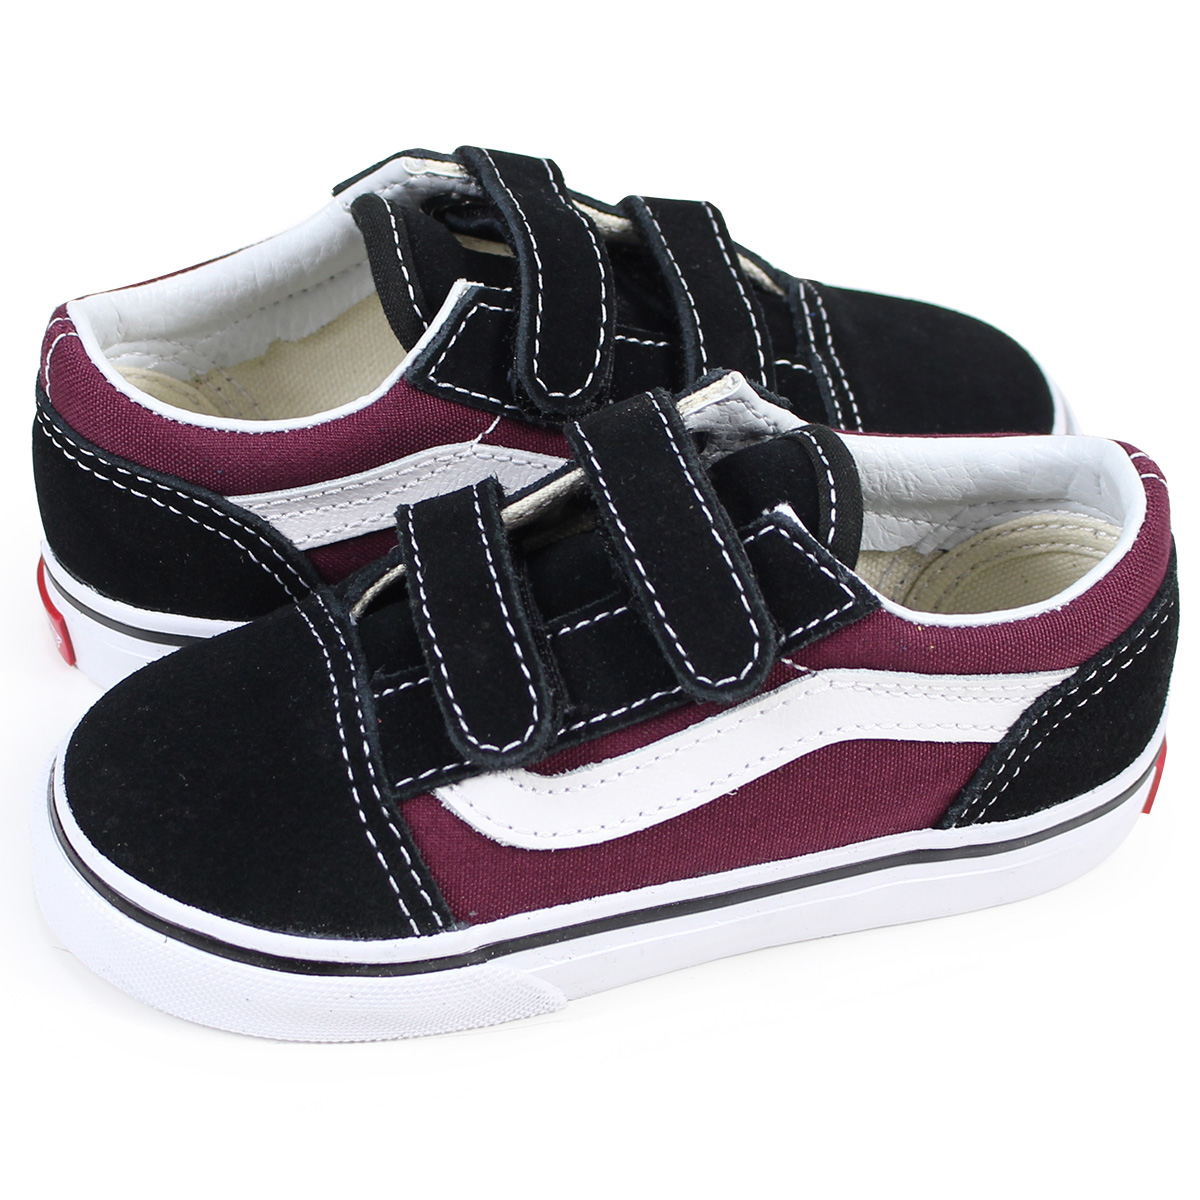 0457bf3e540f Whats up Sports  VANS OLD SKOOL V old school baby sneakers vans ...